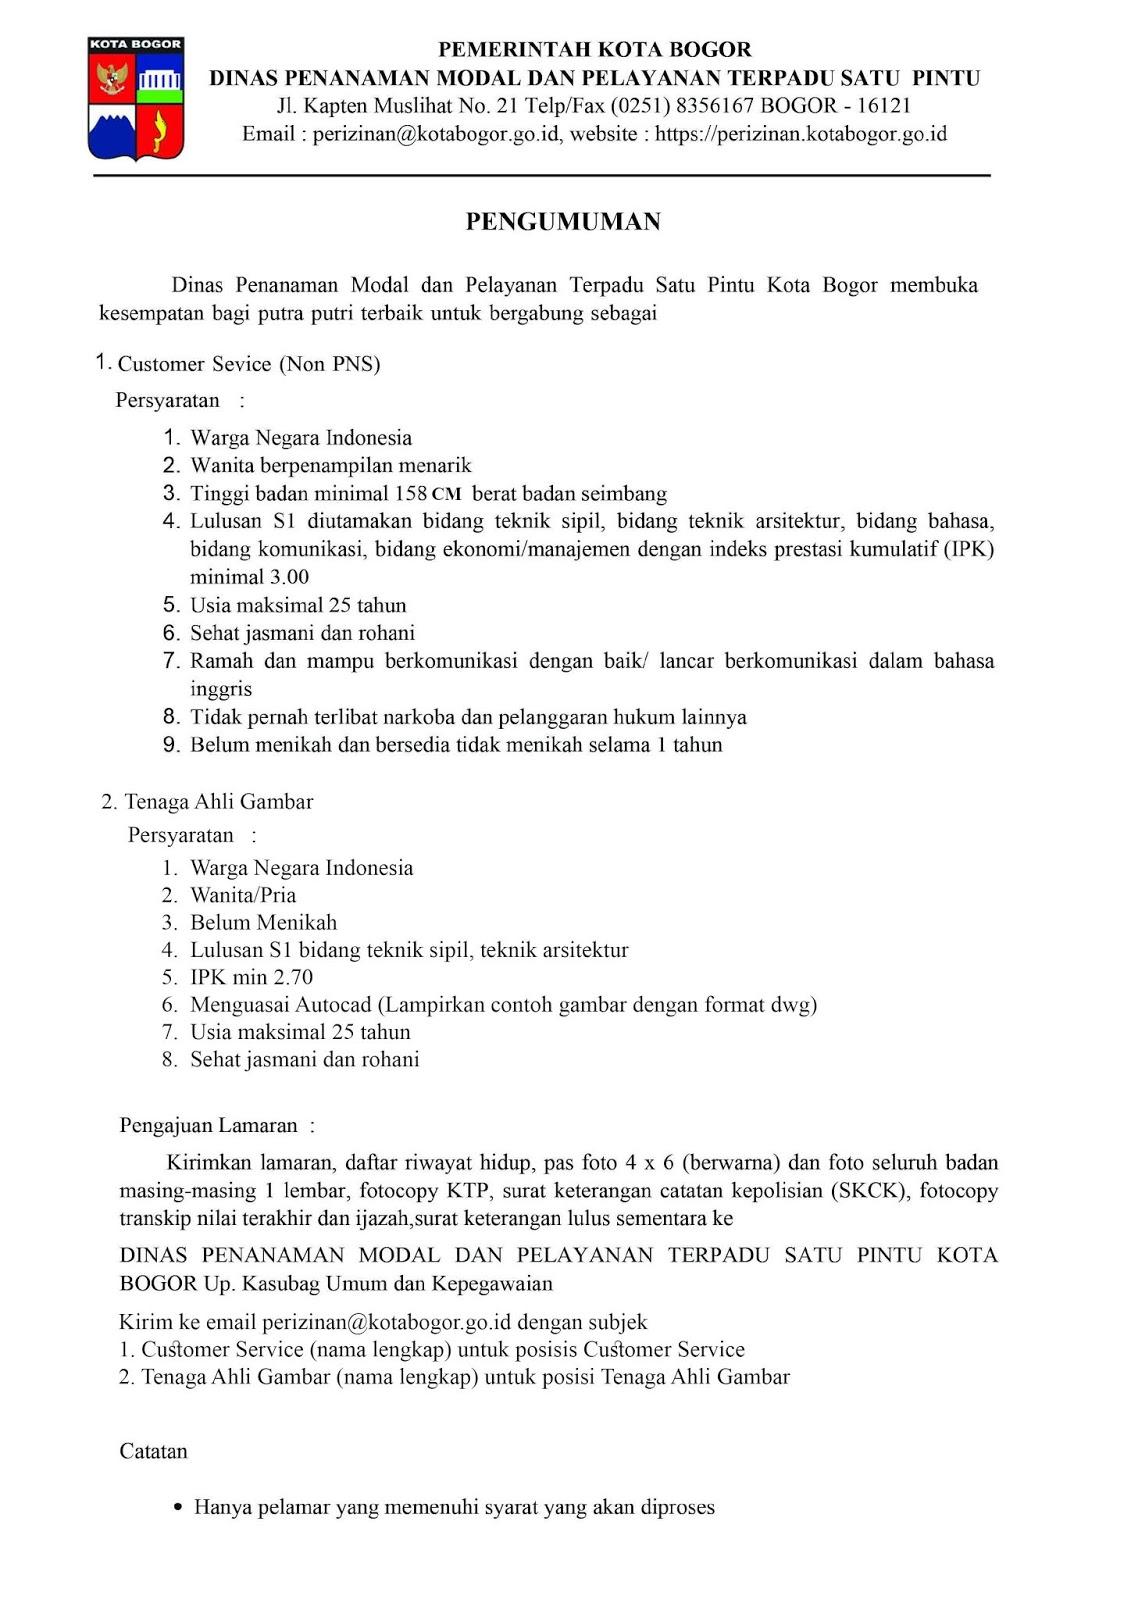 Penerimaan Non PNS Dinas Penanaman Modal dan Pelayanan Terpadu Satu Pintu Kota Bogor Bulan Januari 2020